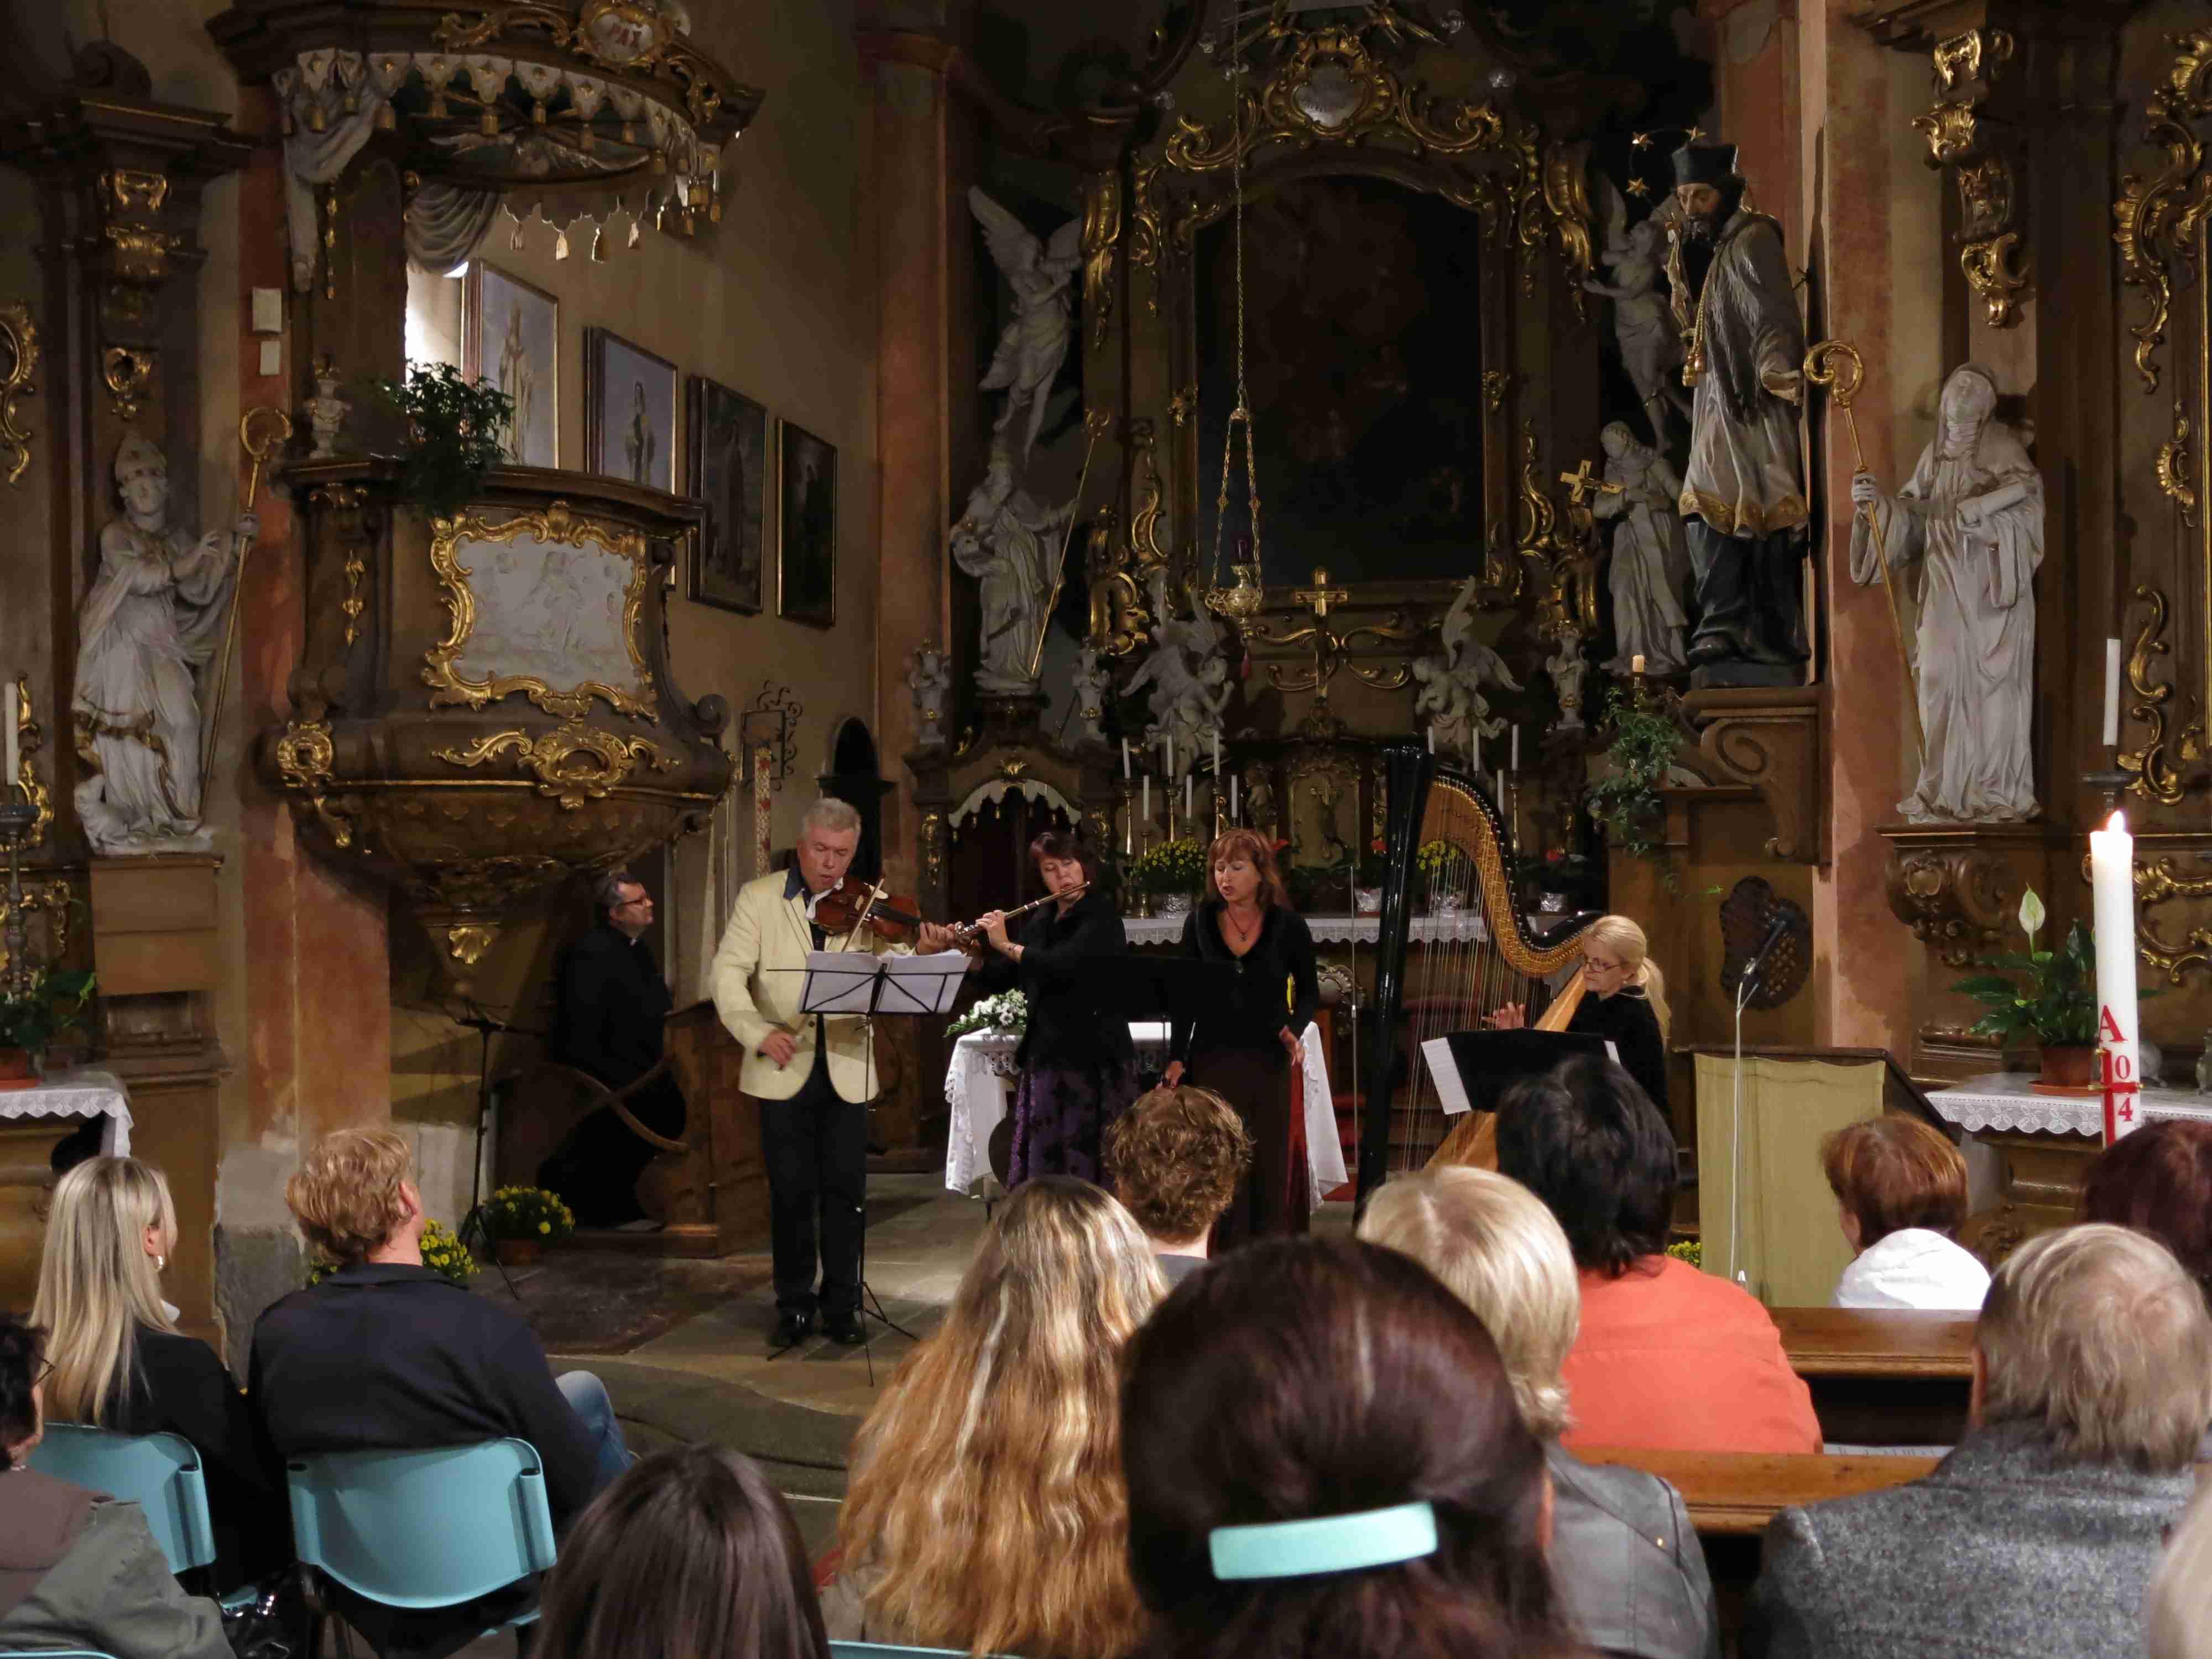 pouť ke sv. Františku 2014 - koncert - 2